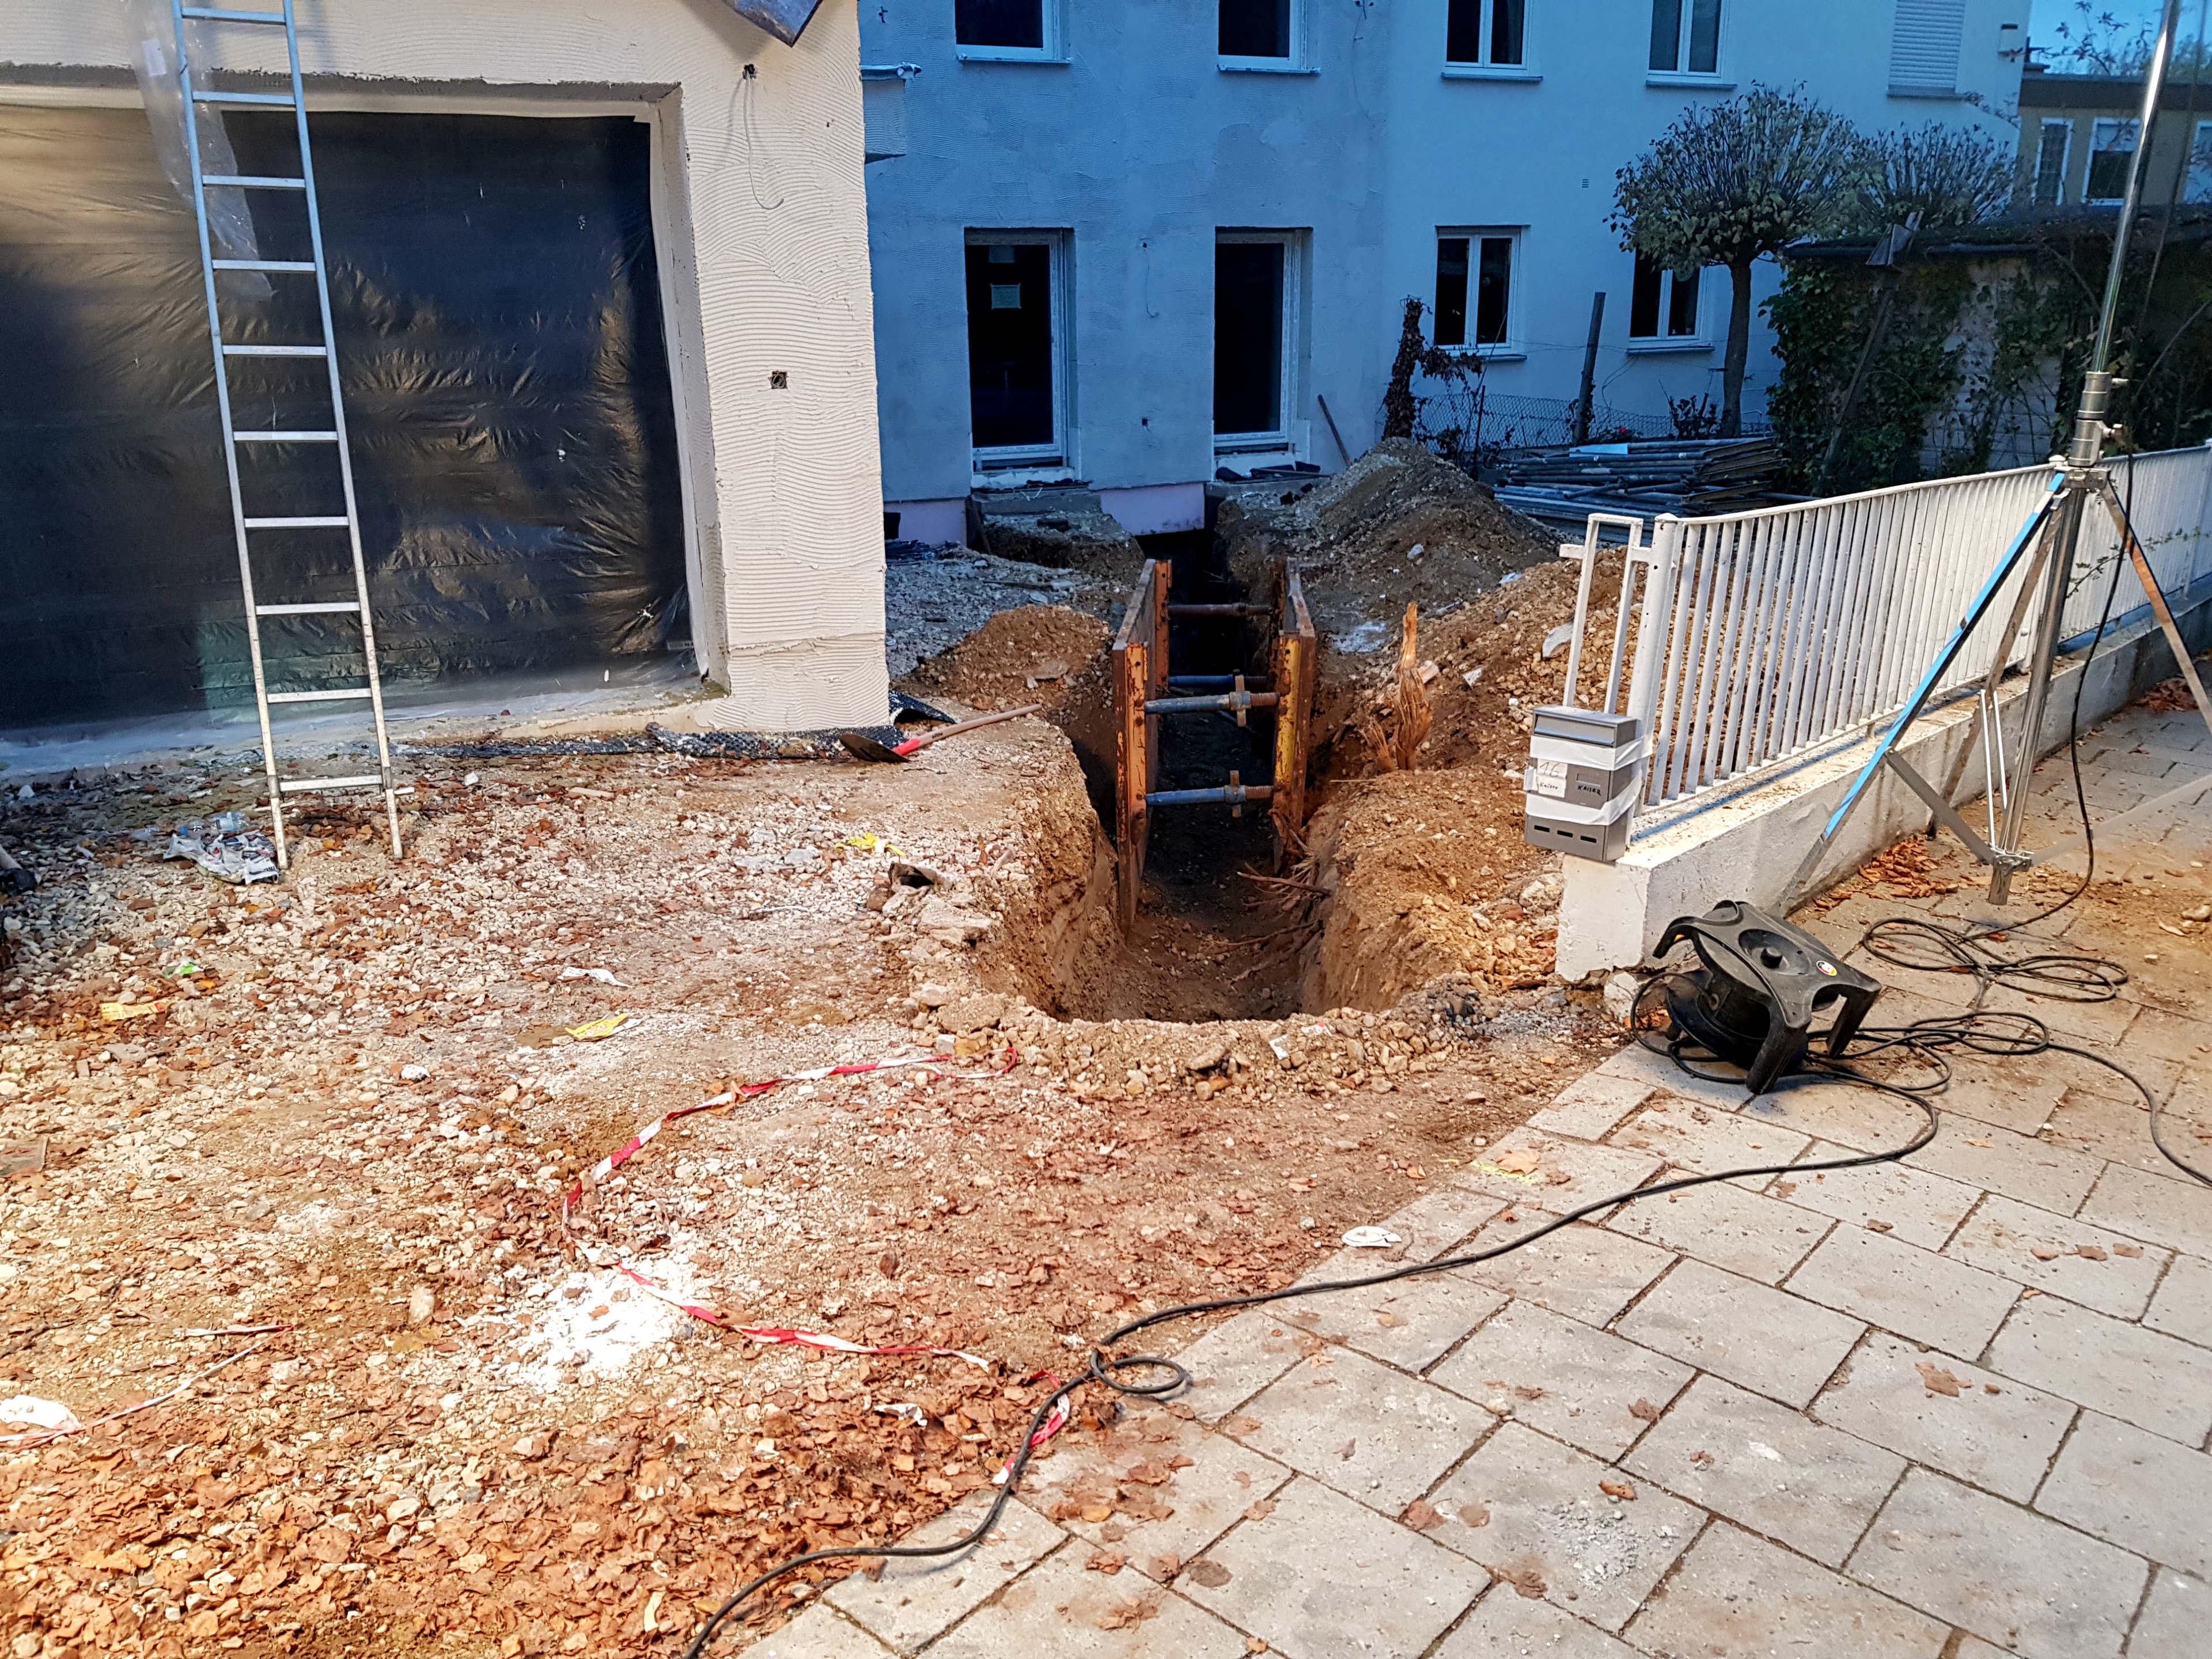 Bombenfund Regensburg Heute